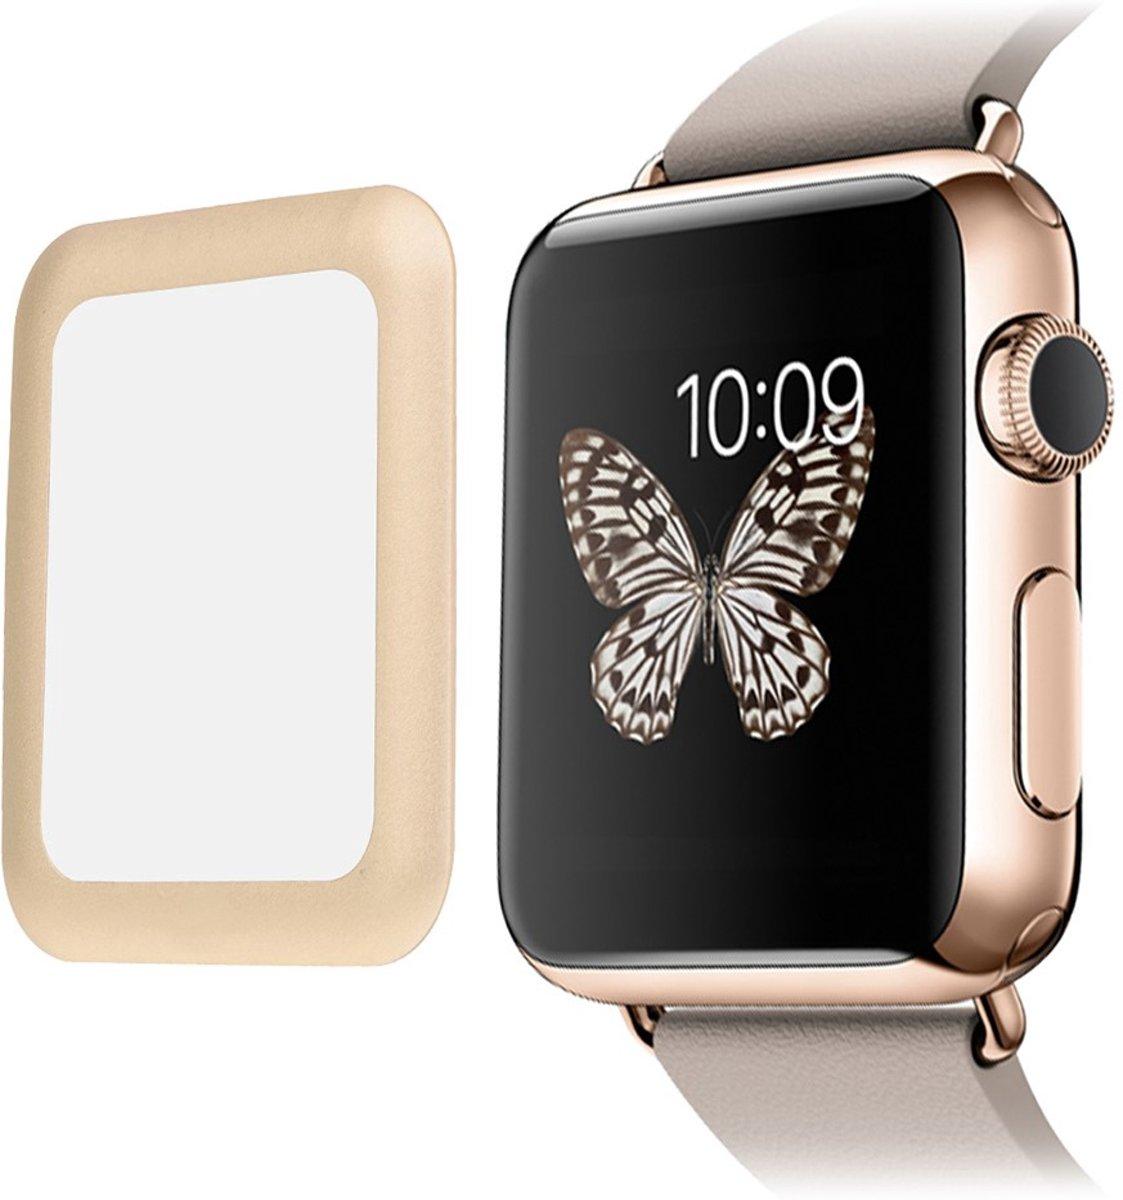 Tempered Glass Screen 0.2mm voor Apple Watch 42mm (Series 1 / Series 2 / Series 3) Full Coverage - Goud kopen